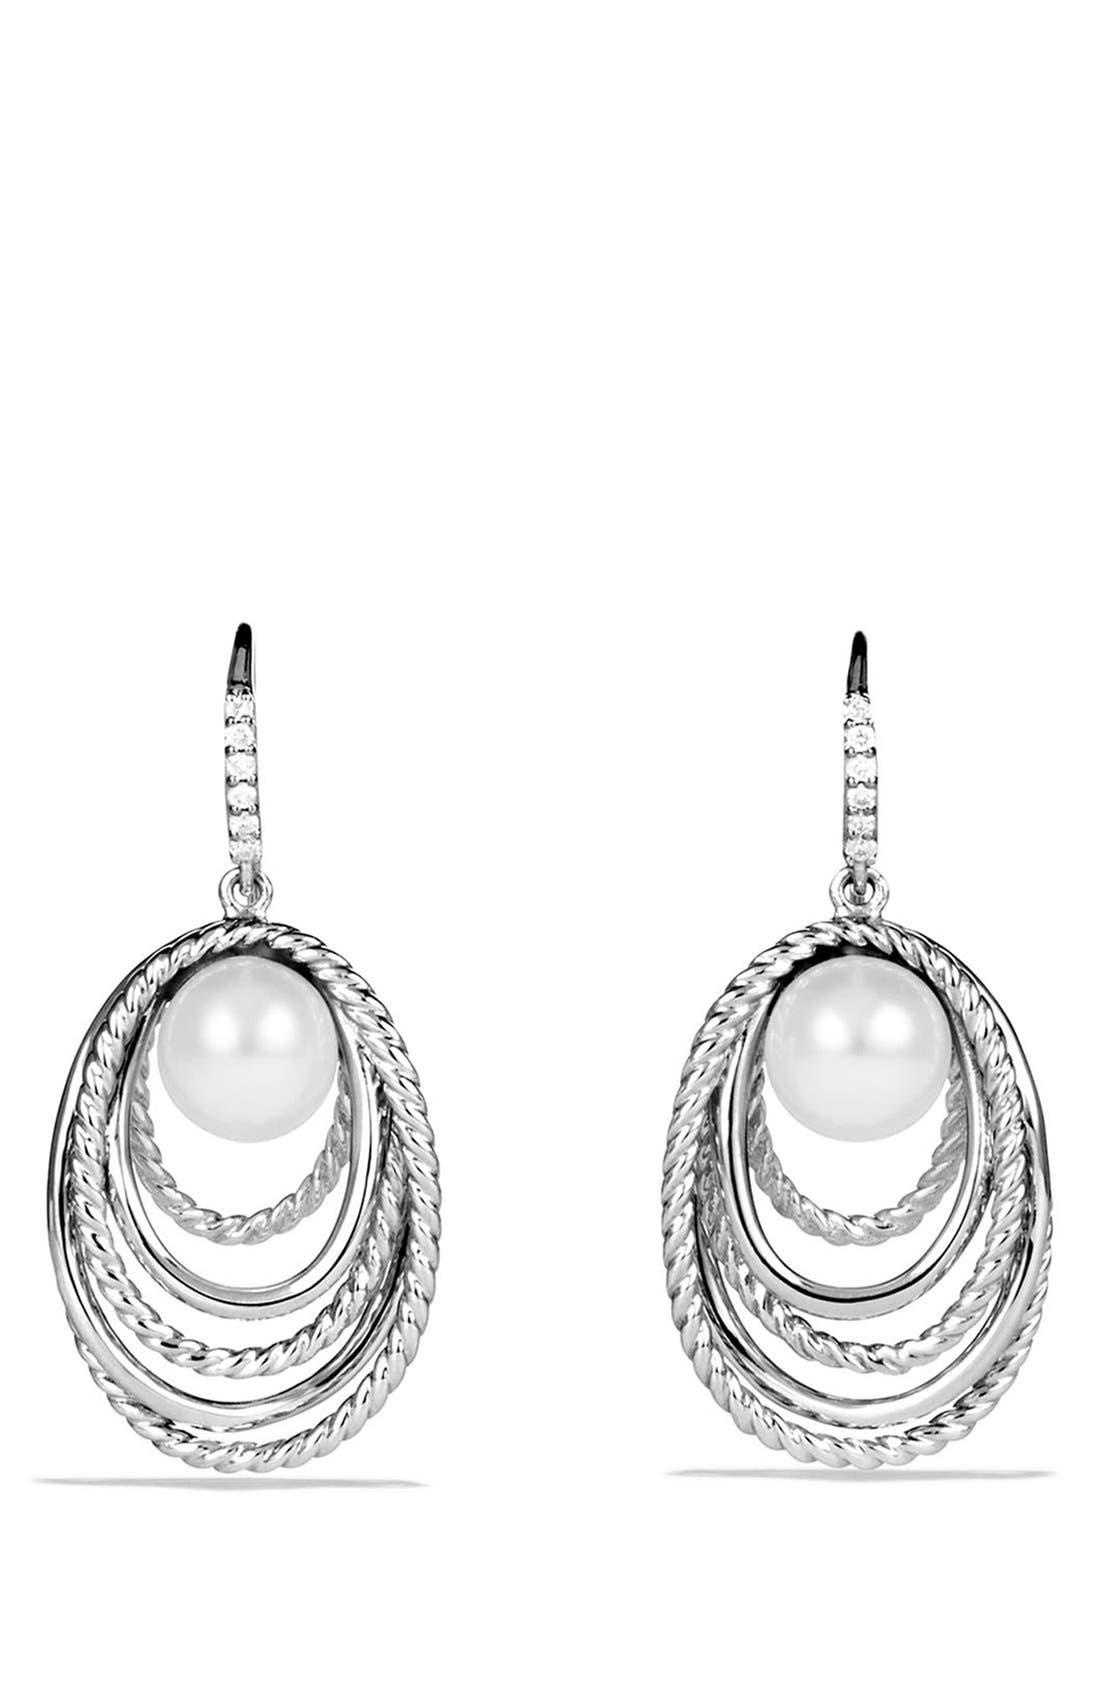 Main Image - David Yurman 'Crossover' Pearl Drop Earrings with Diamonds